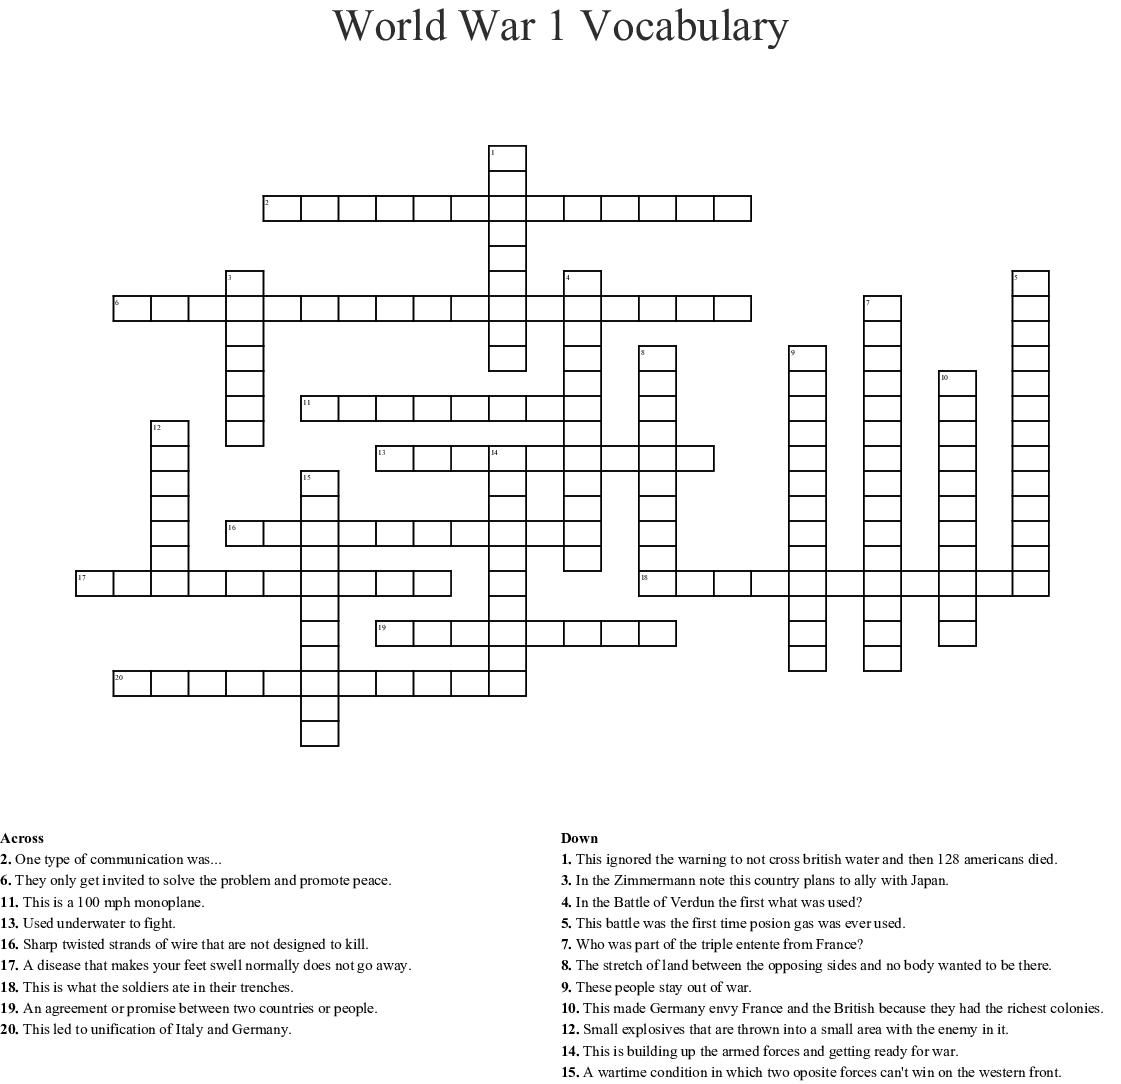 World War 1 Vocabulary Crossword